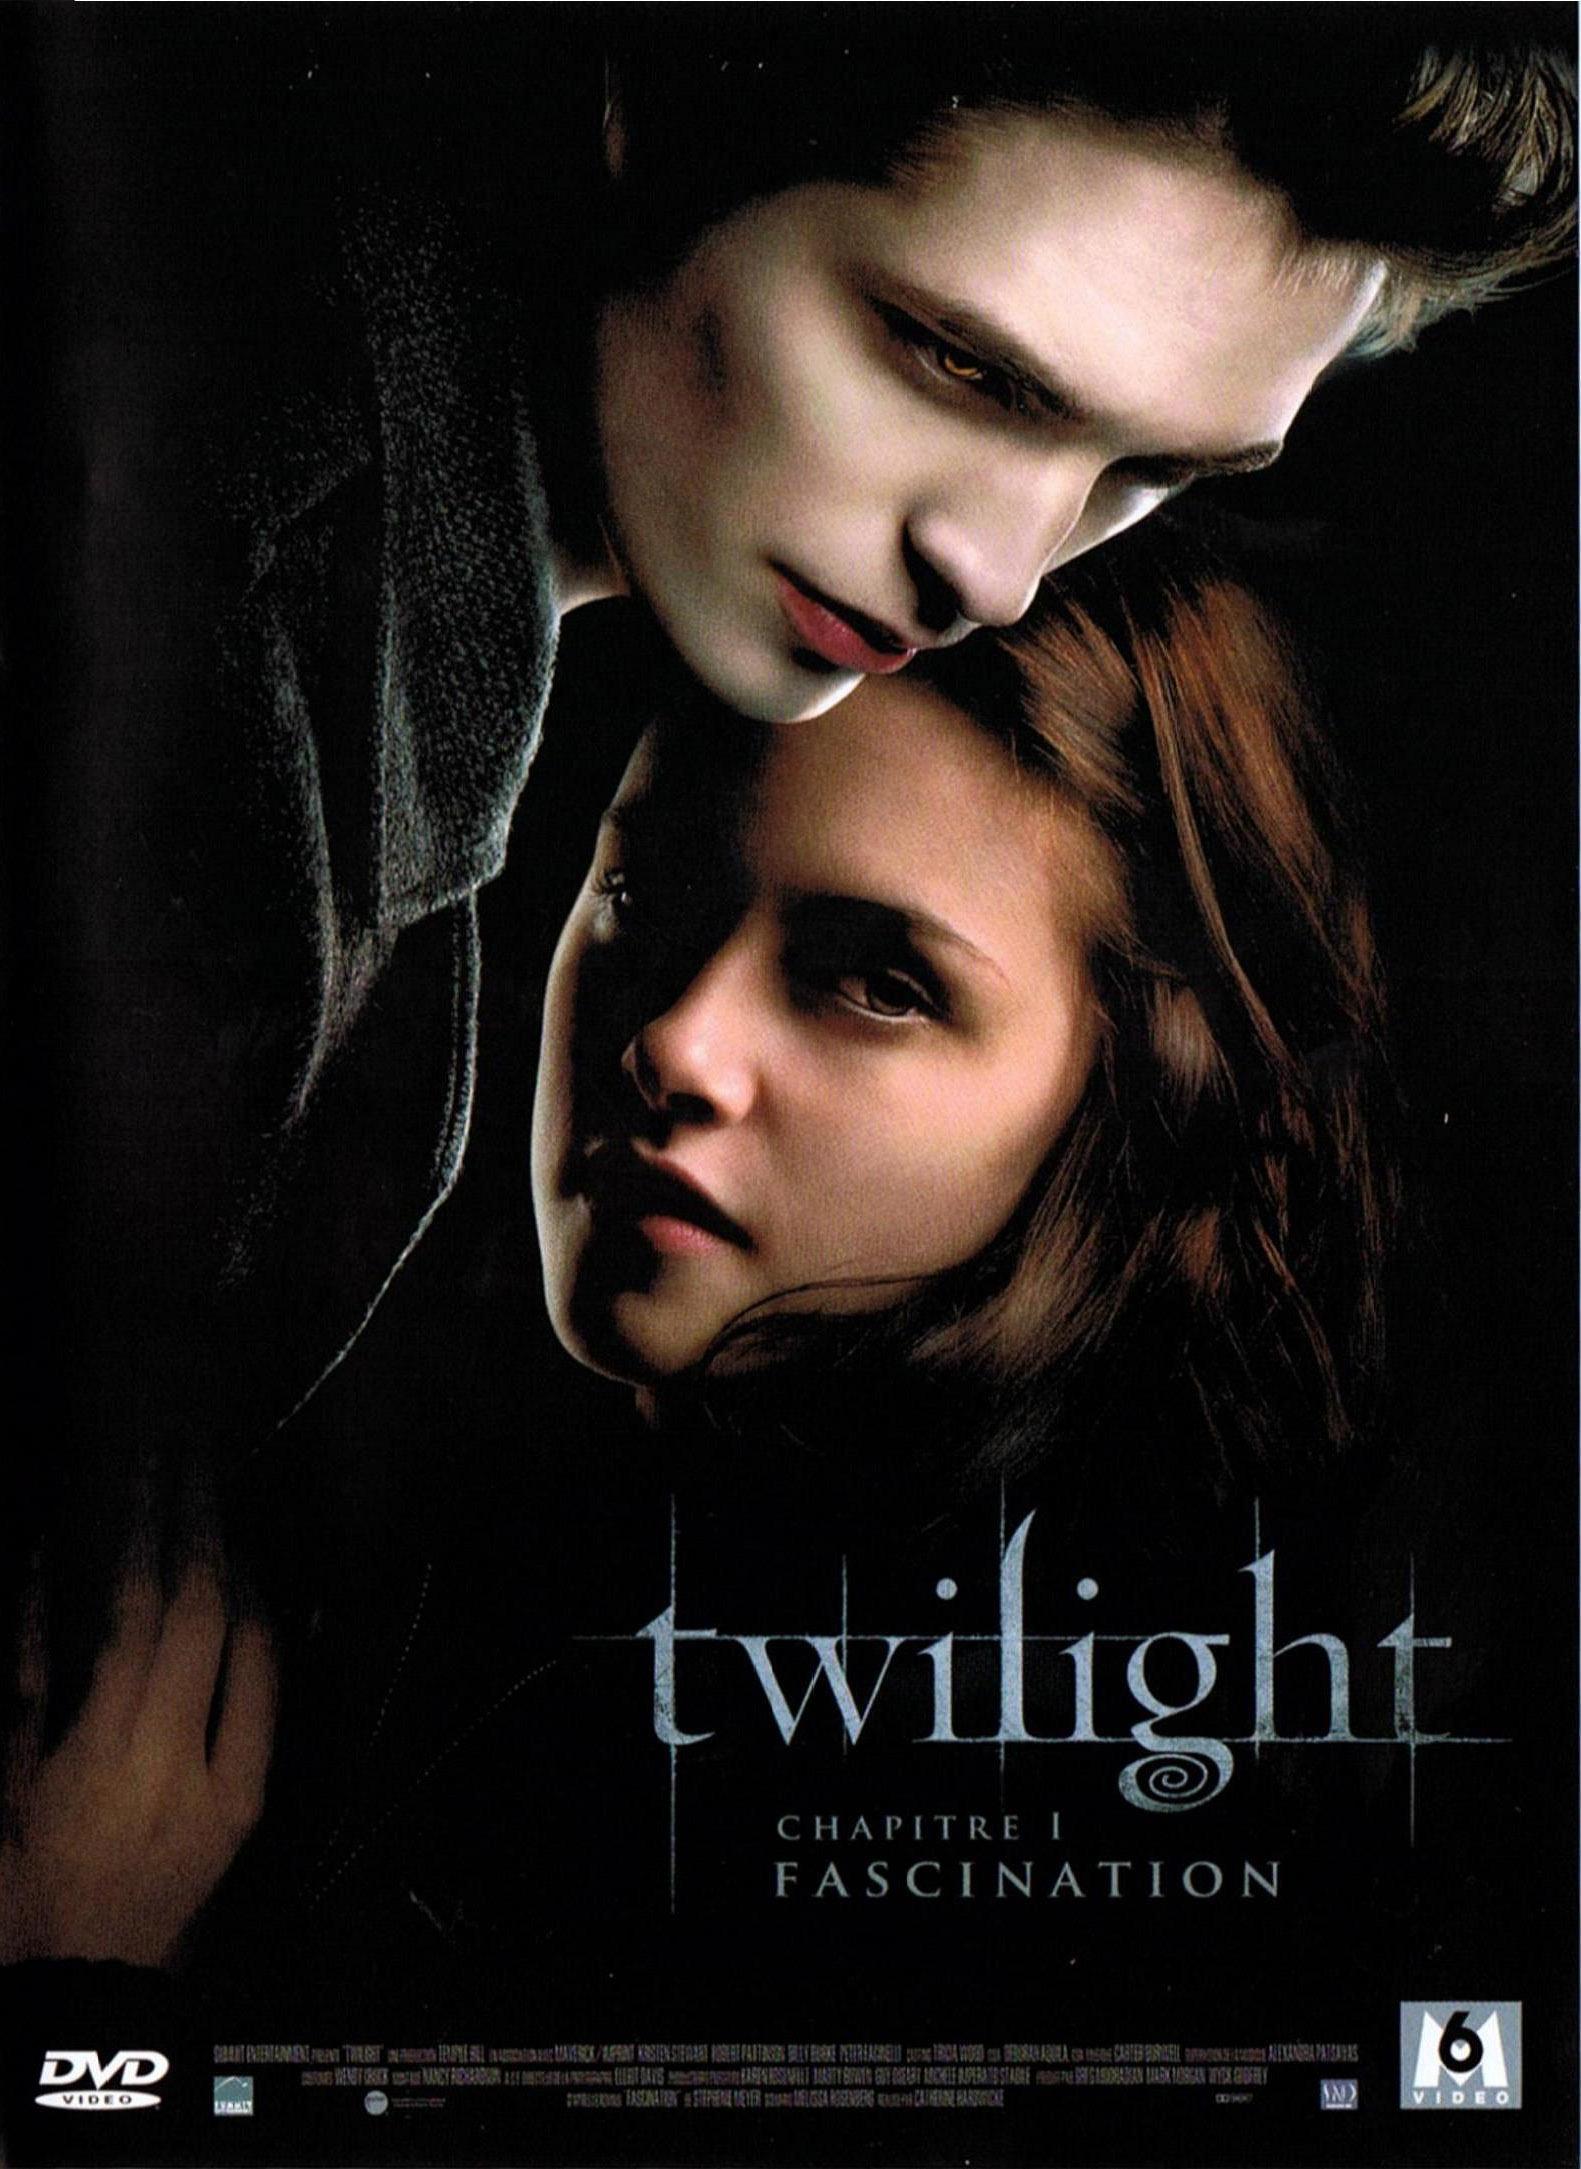 Twilight - Chapitre 1 : Fascination 1 - Twilight Chapitre 1 : Fascination